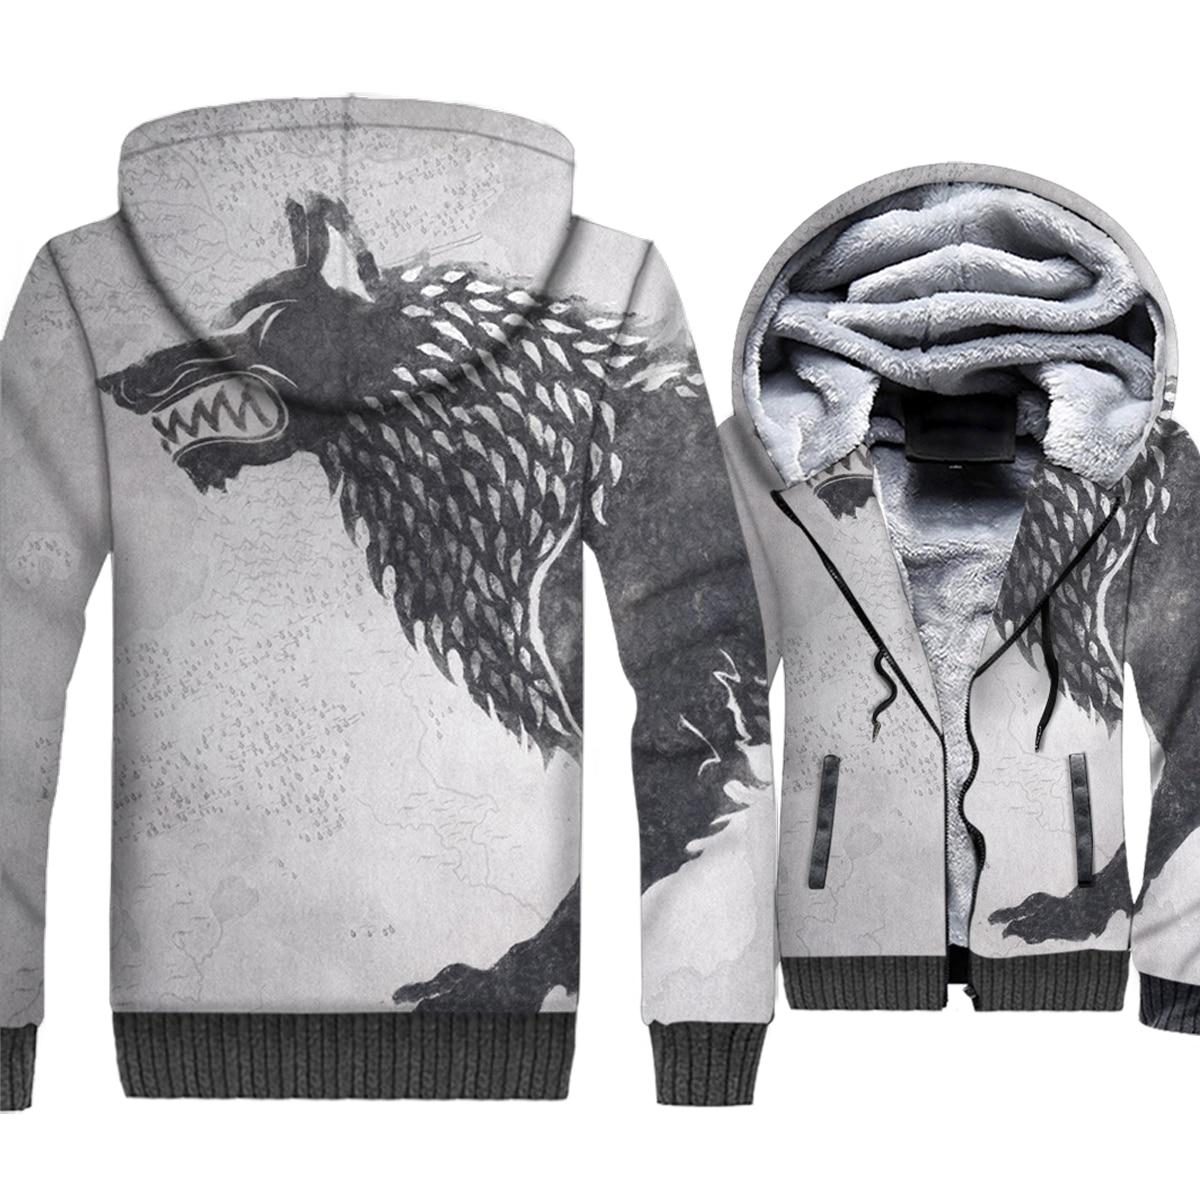 Game of Thrones 3D Print Hoodie Men House Stark Hooded Sweatshirt Winter Thick Fleece Zip up Coat Wolf Jacket Hip Hop Streetwear in Hoodies amp Sweatshirts from Men 39 s Clothing